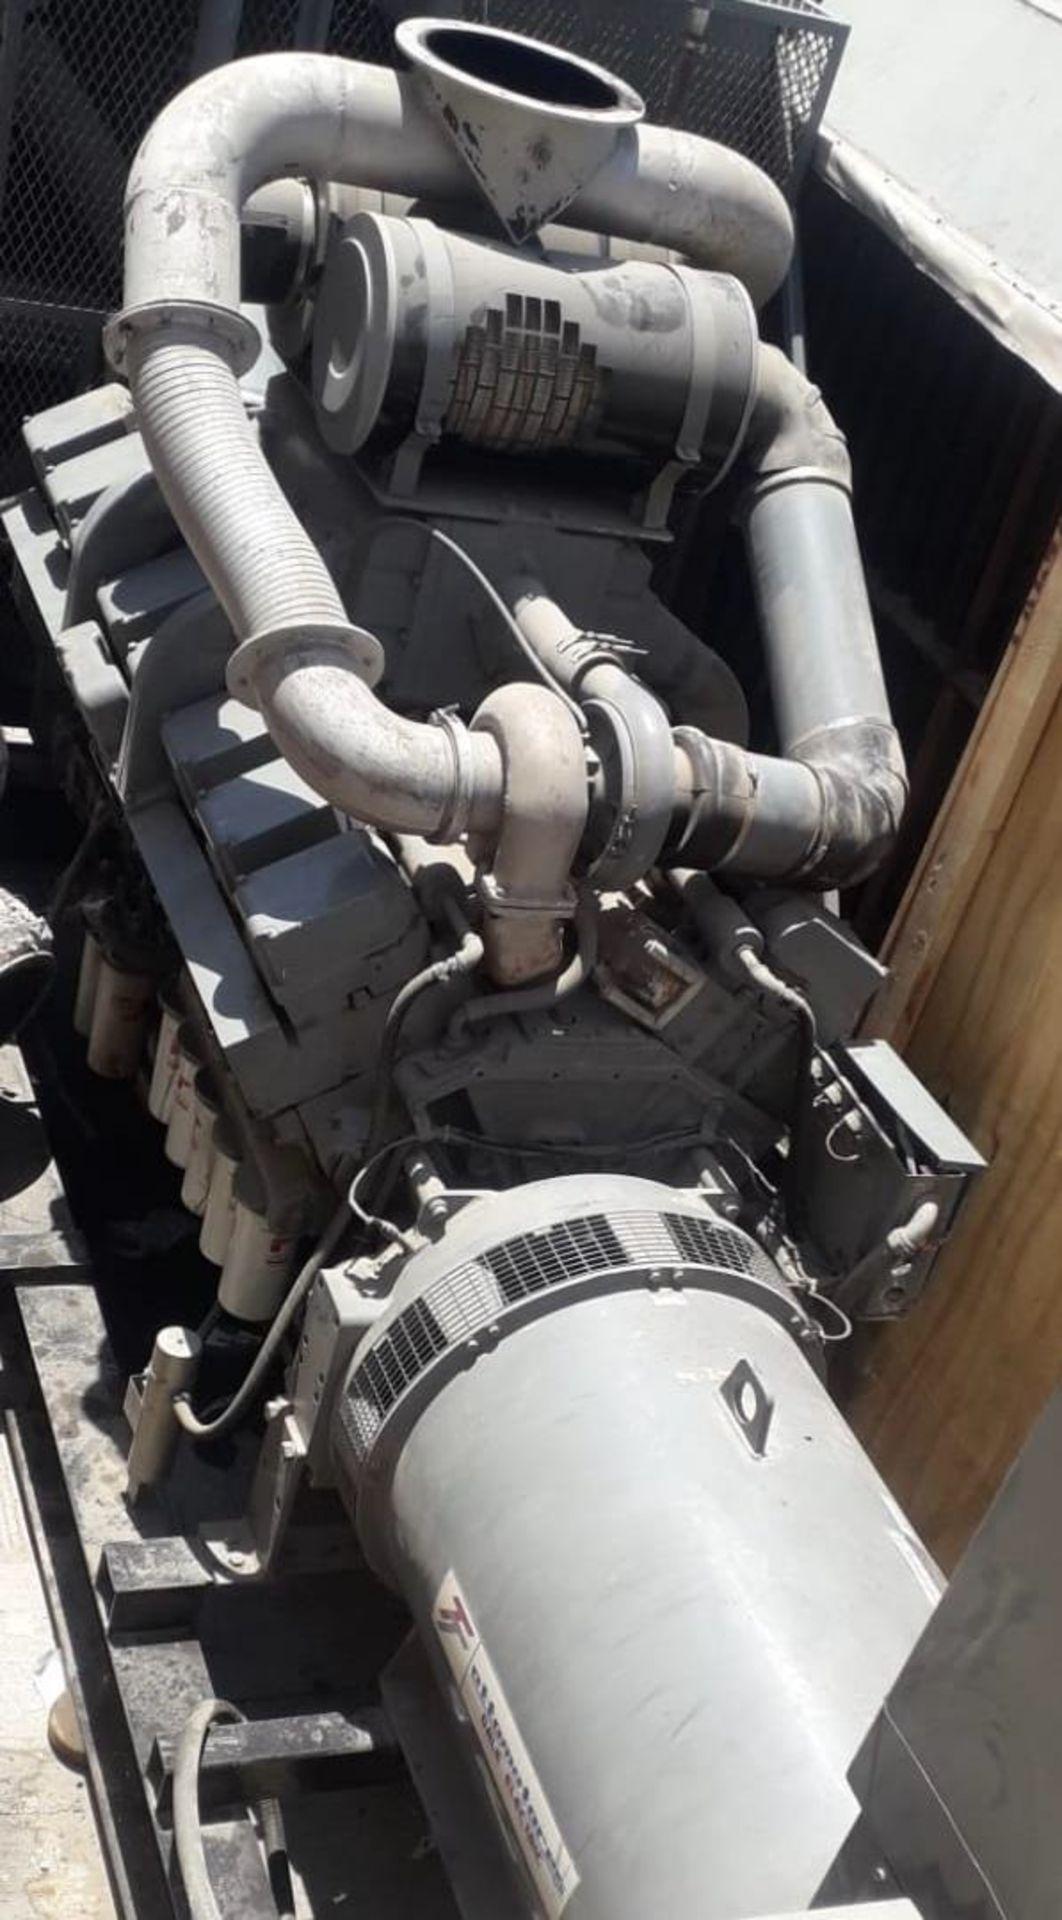 Ottomotores Emergency Plant capacity 1133 KW/1416 KVA, voltage 2020/440 - Image 3 of 4